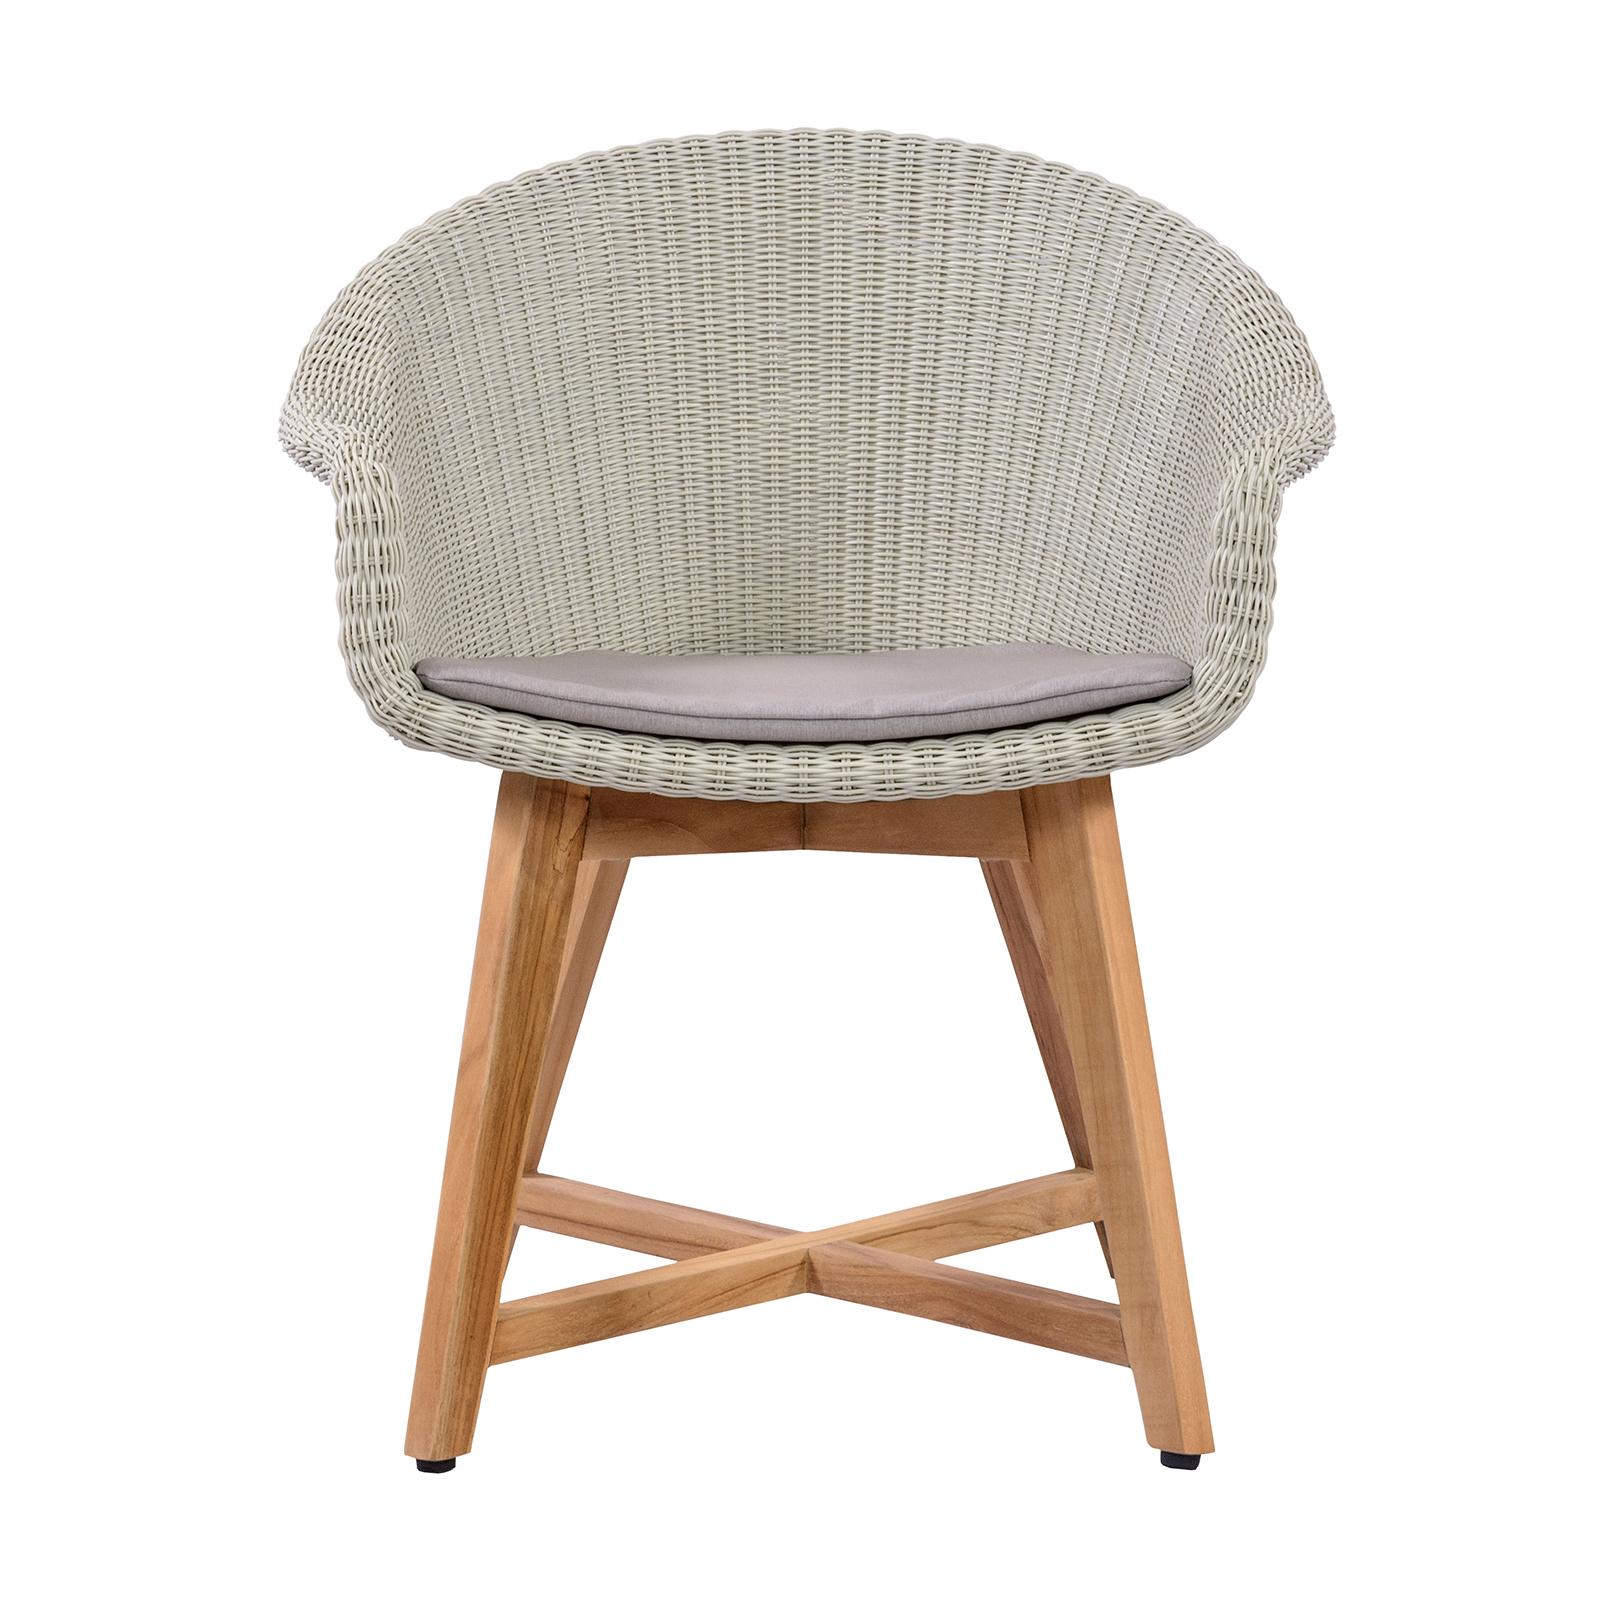 Gartenstuhl design Sessel Stuhl rattan Outdoor Gartenmöbel ...